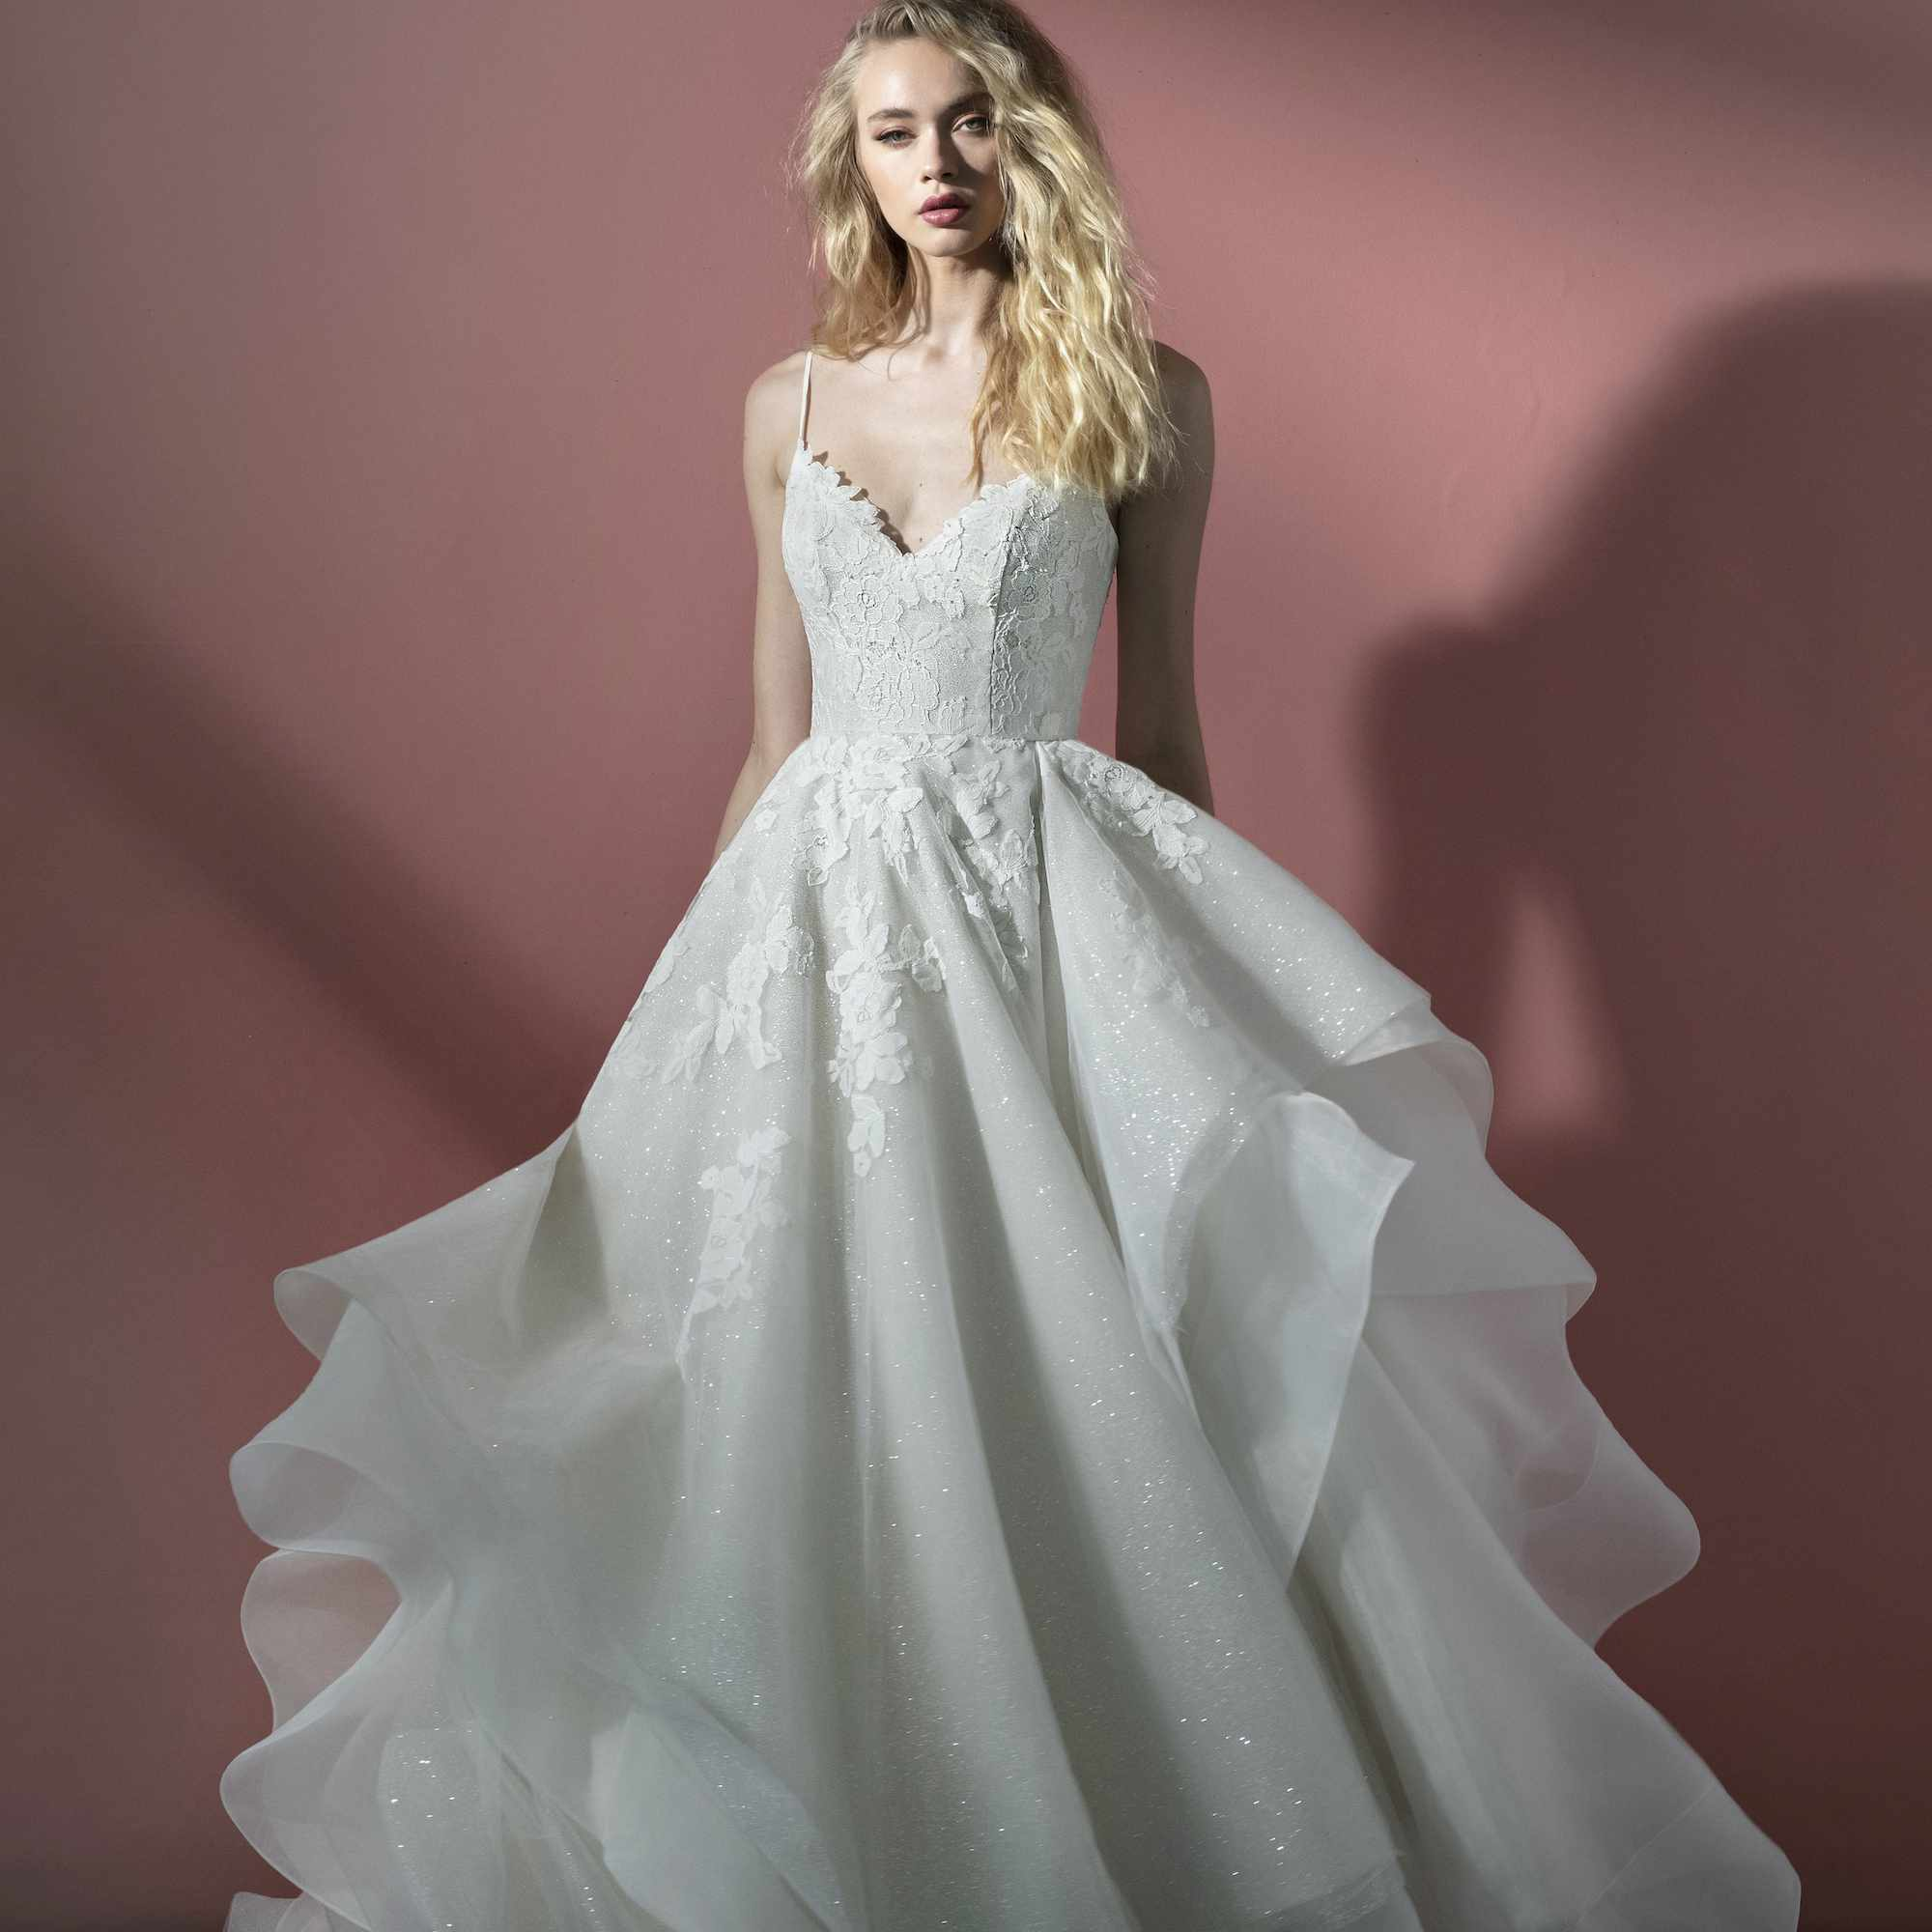 Scout lace wedding dress